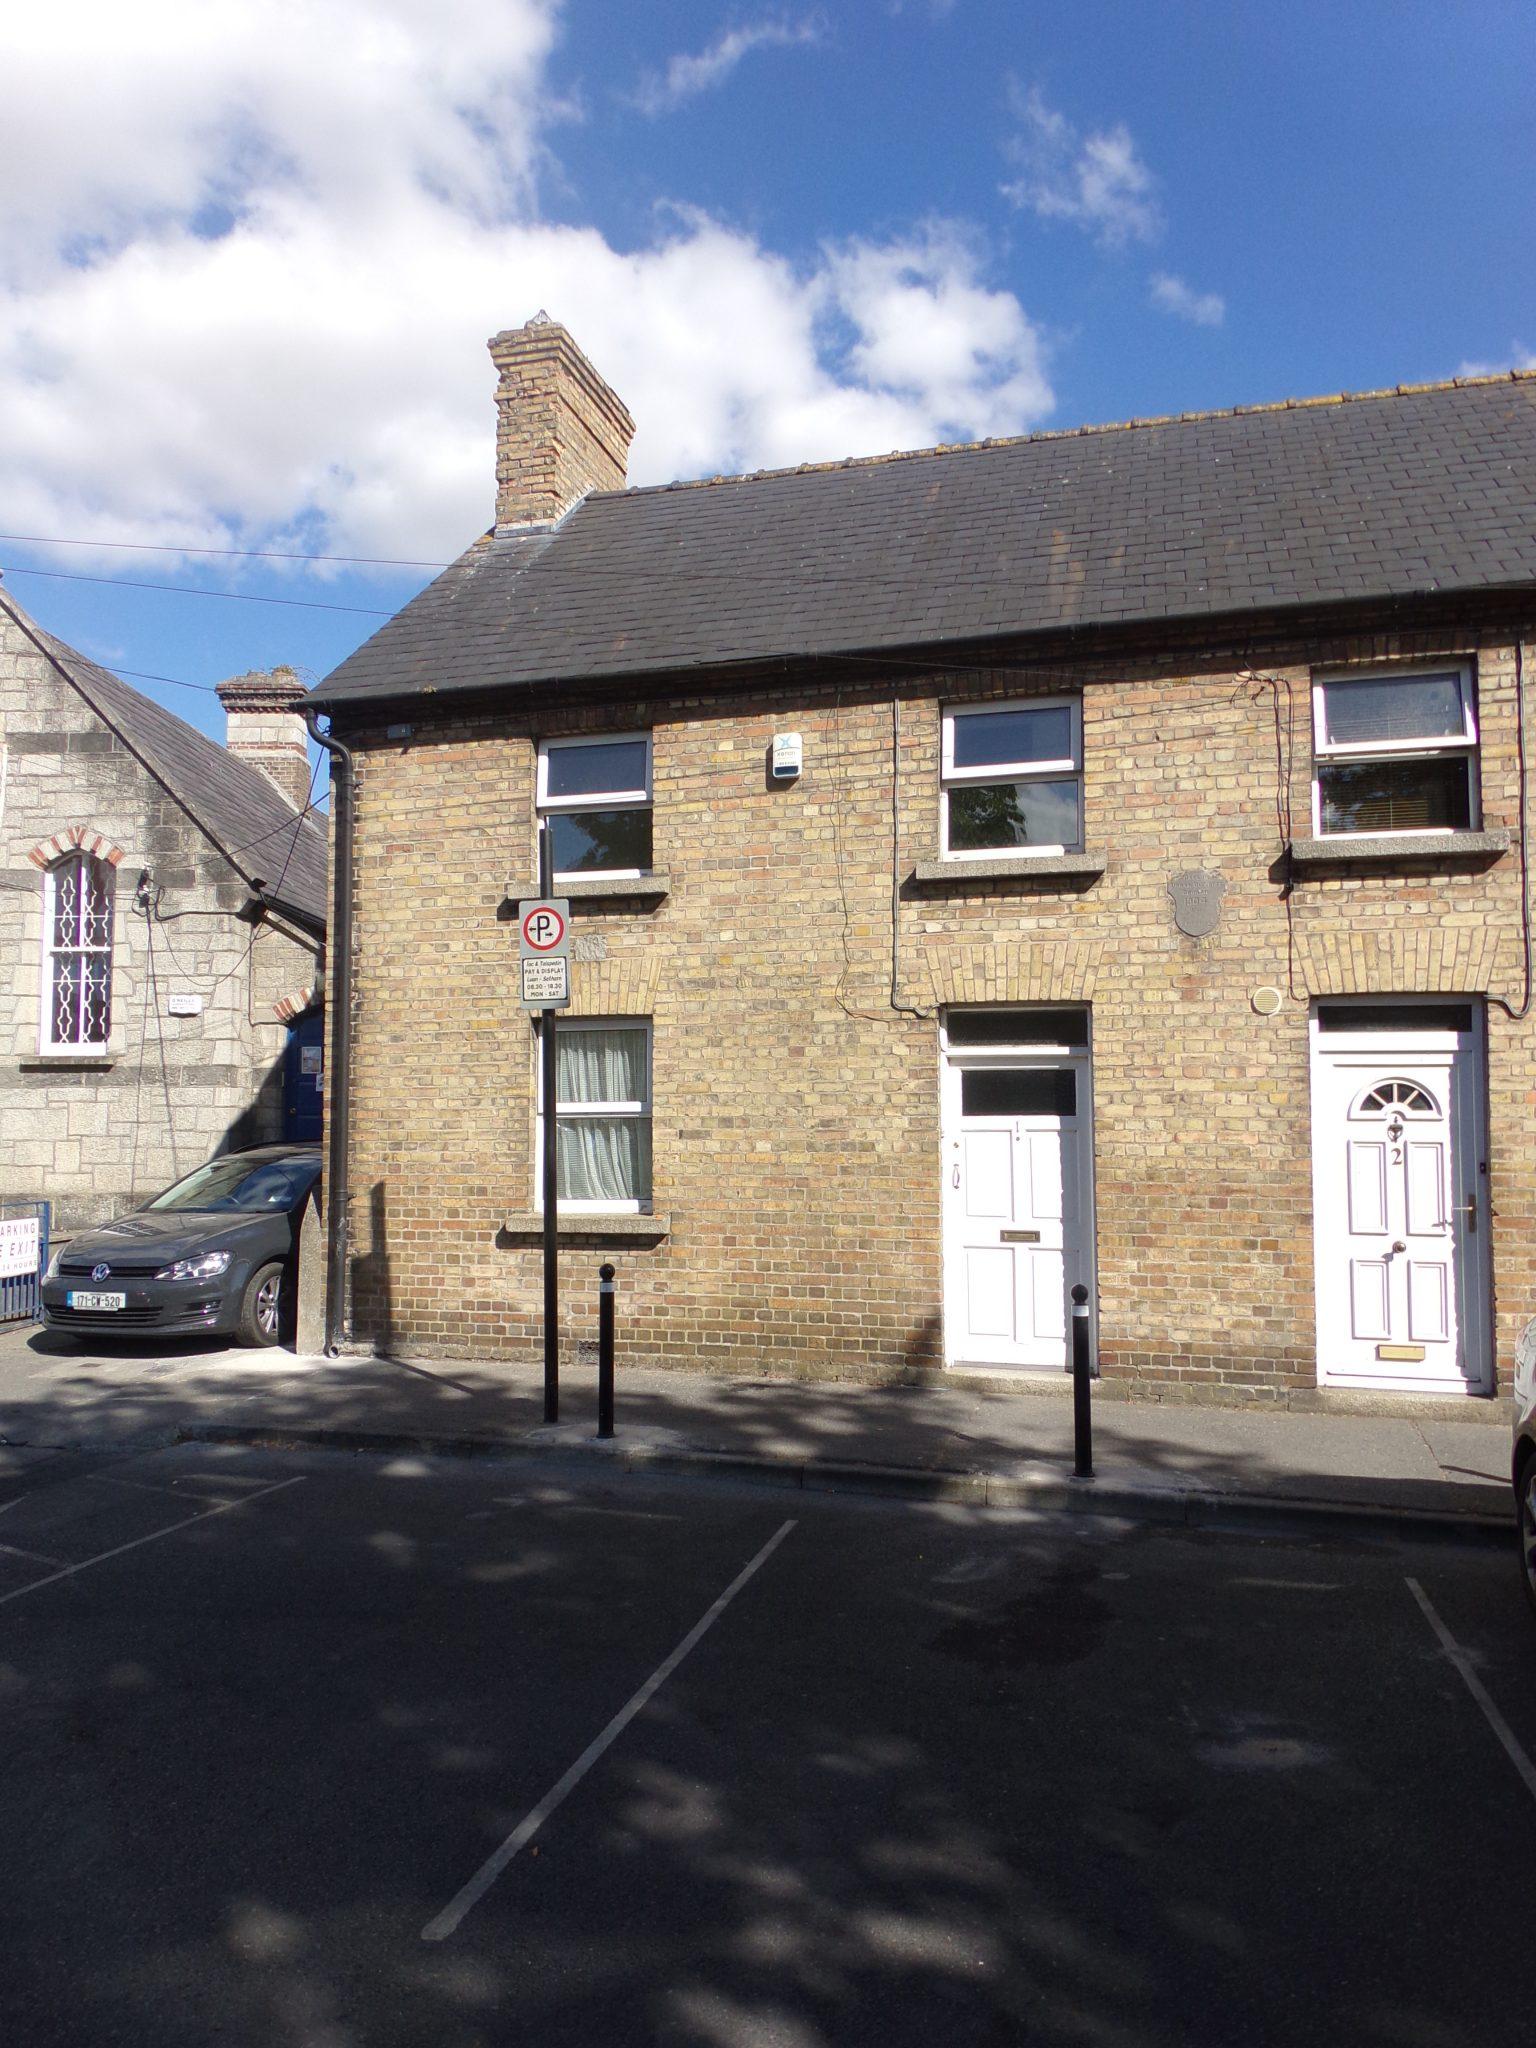 Barrack Street (ref 310), Carlow